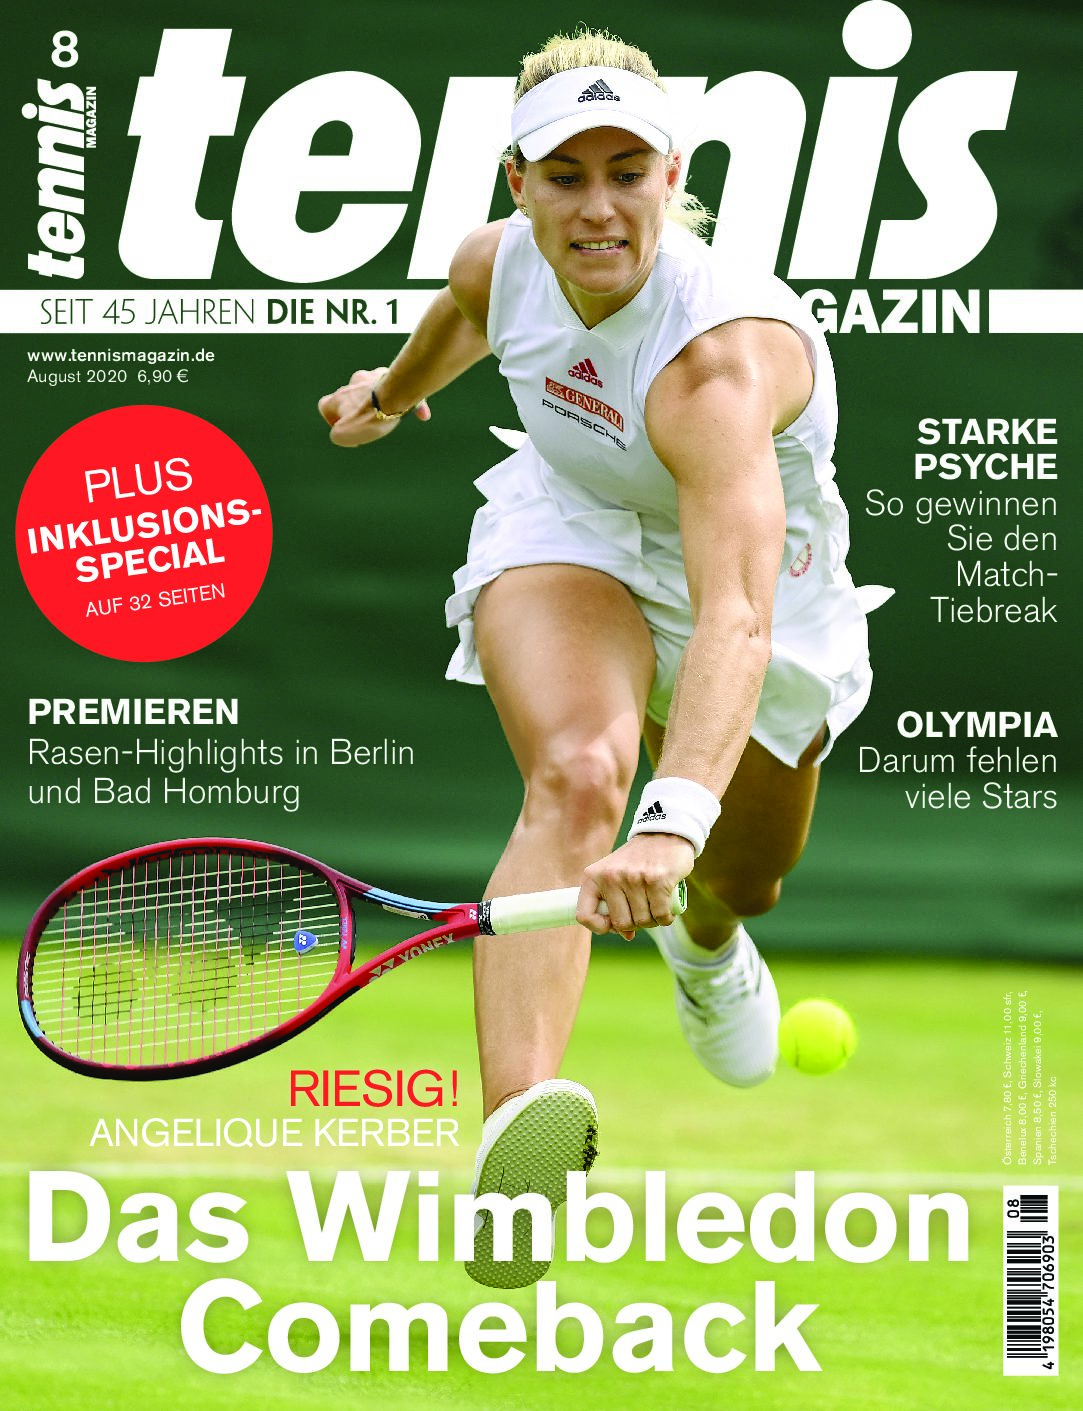 tennis MAGAZIN 08/2020: Das Wimbledon-Comeback